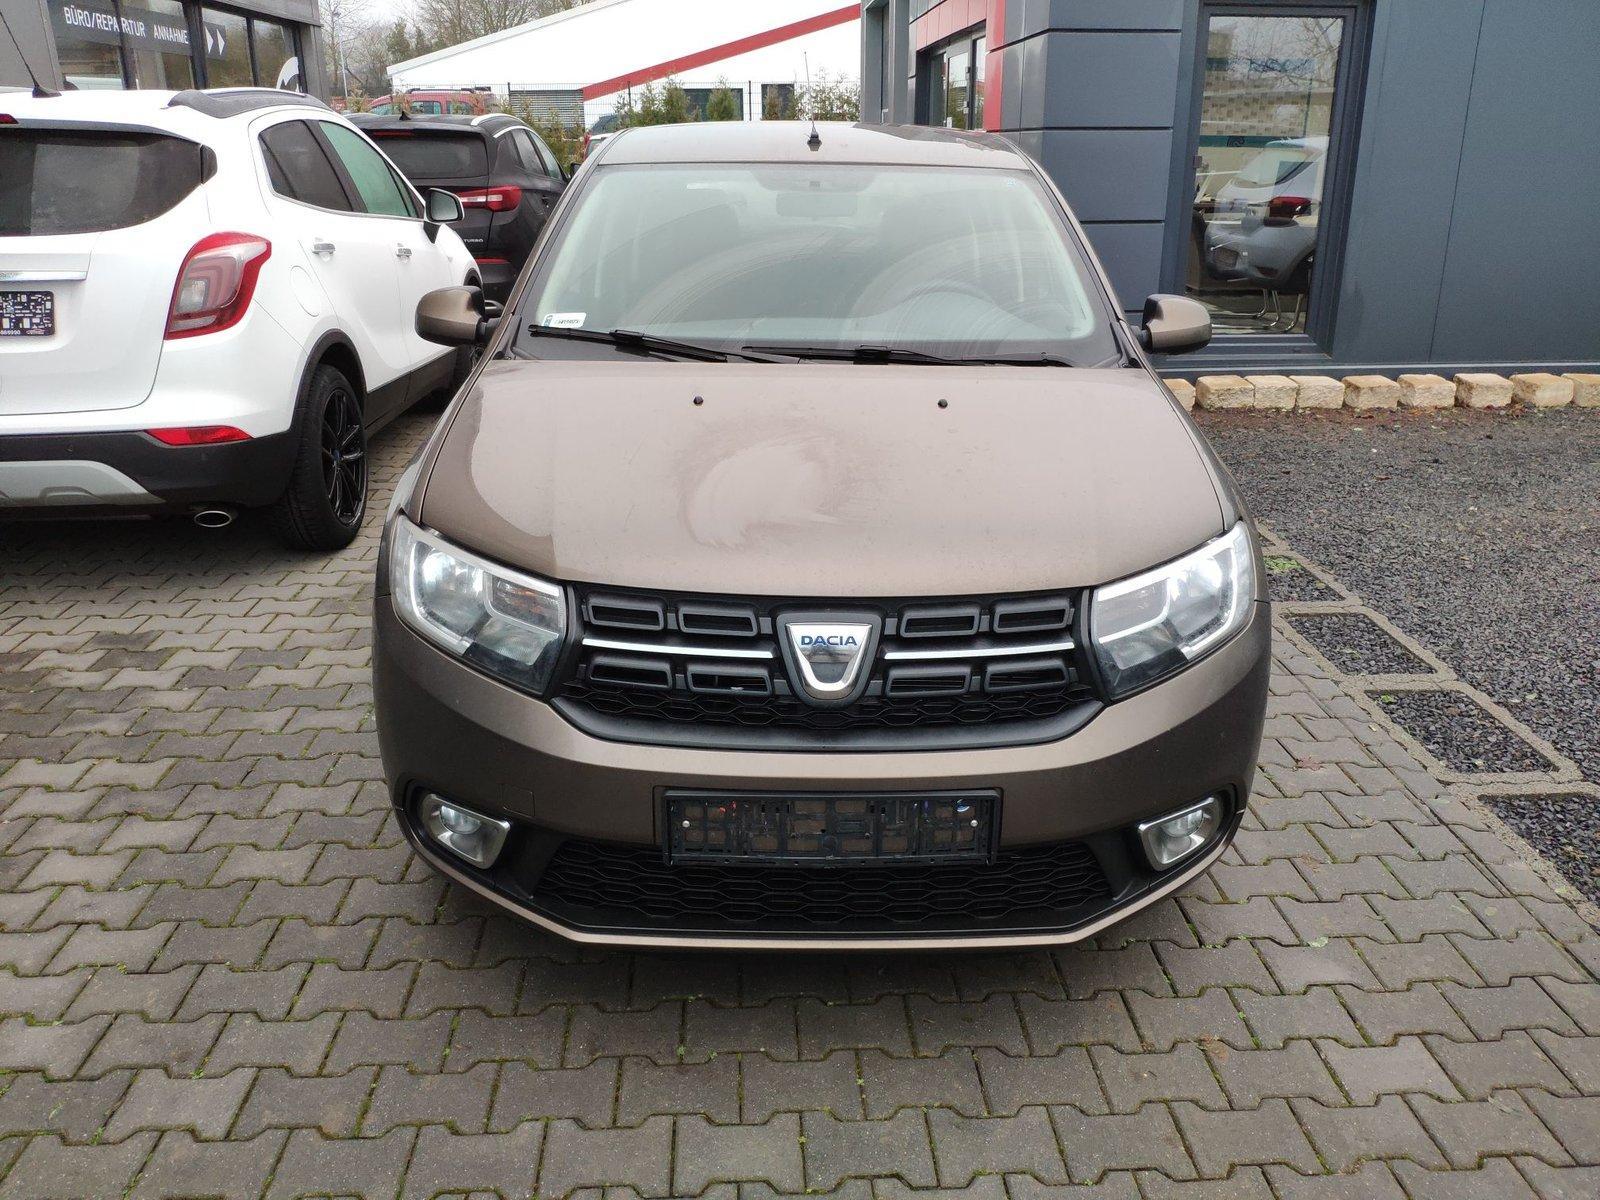 Dacia Sandero II 73 PS Klima ZV Funk uvm